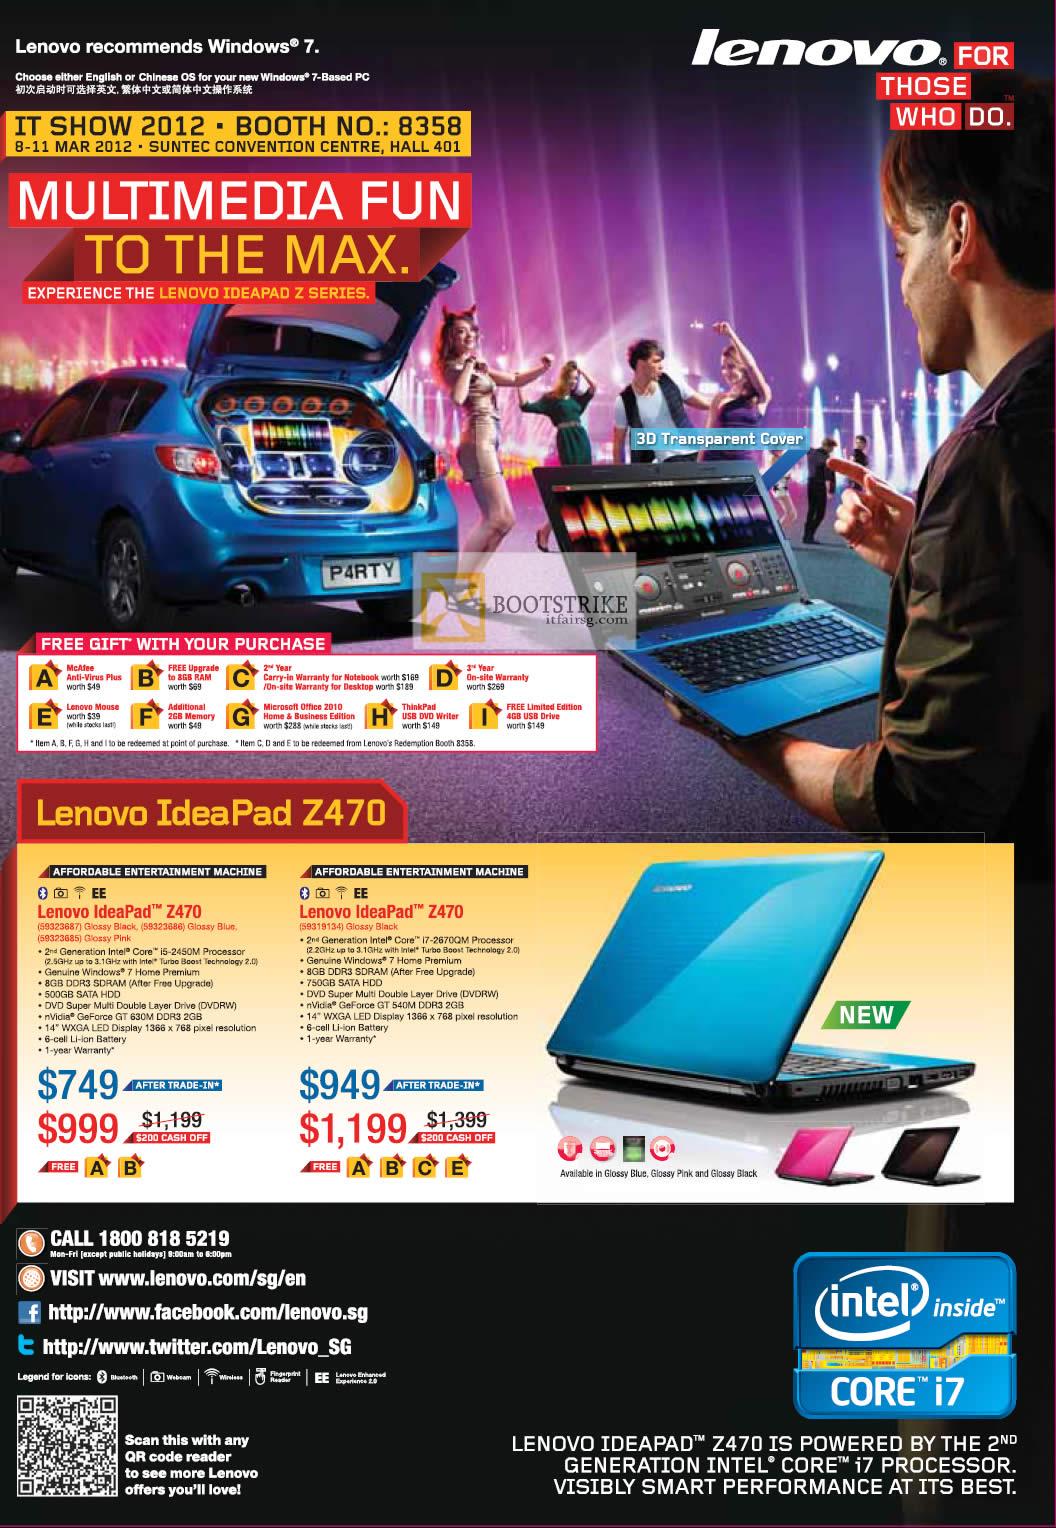 IT SHOW 2012 price list image brochure of Lenovo Notebooks Ideapad Z470 59323687, 59319134